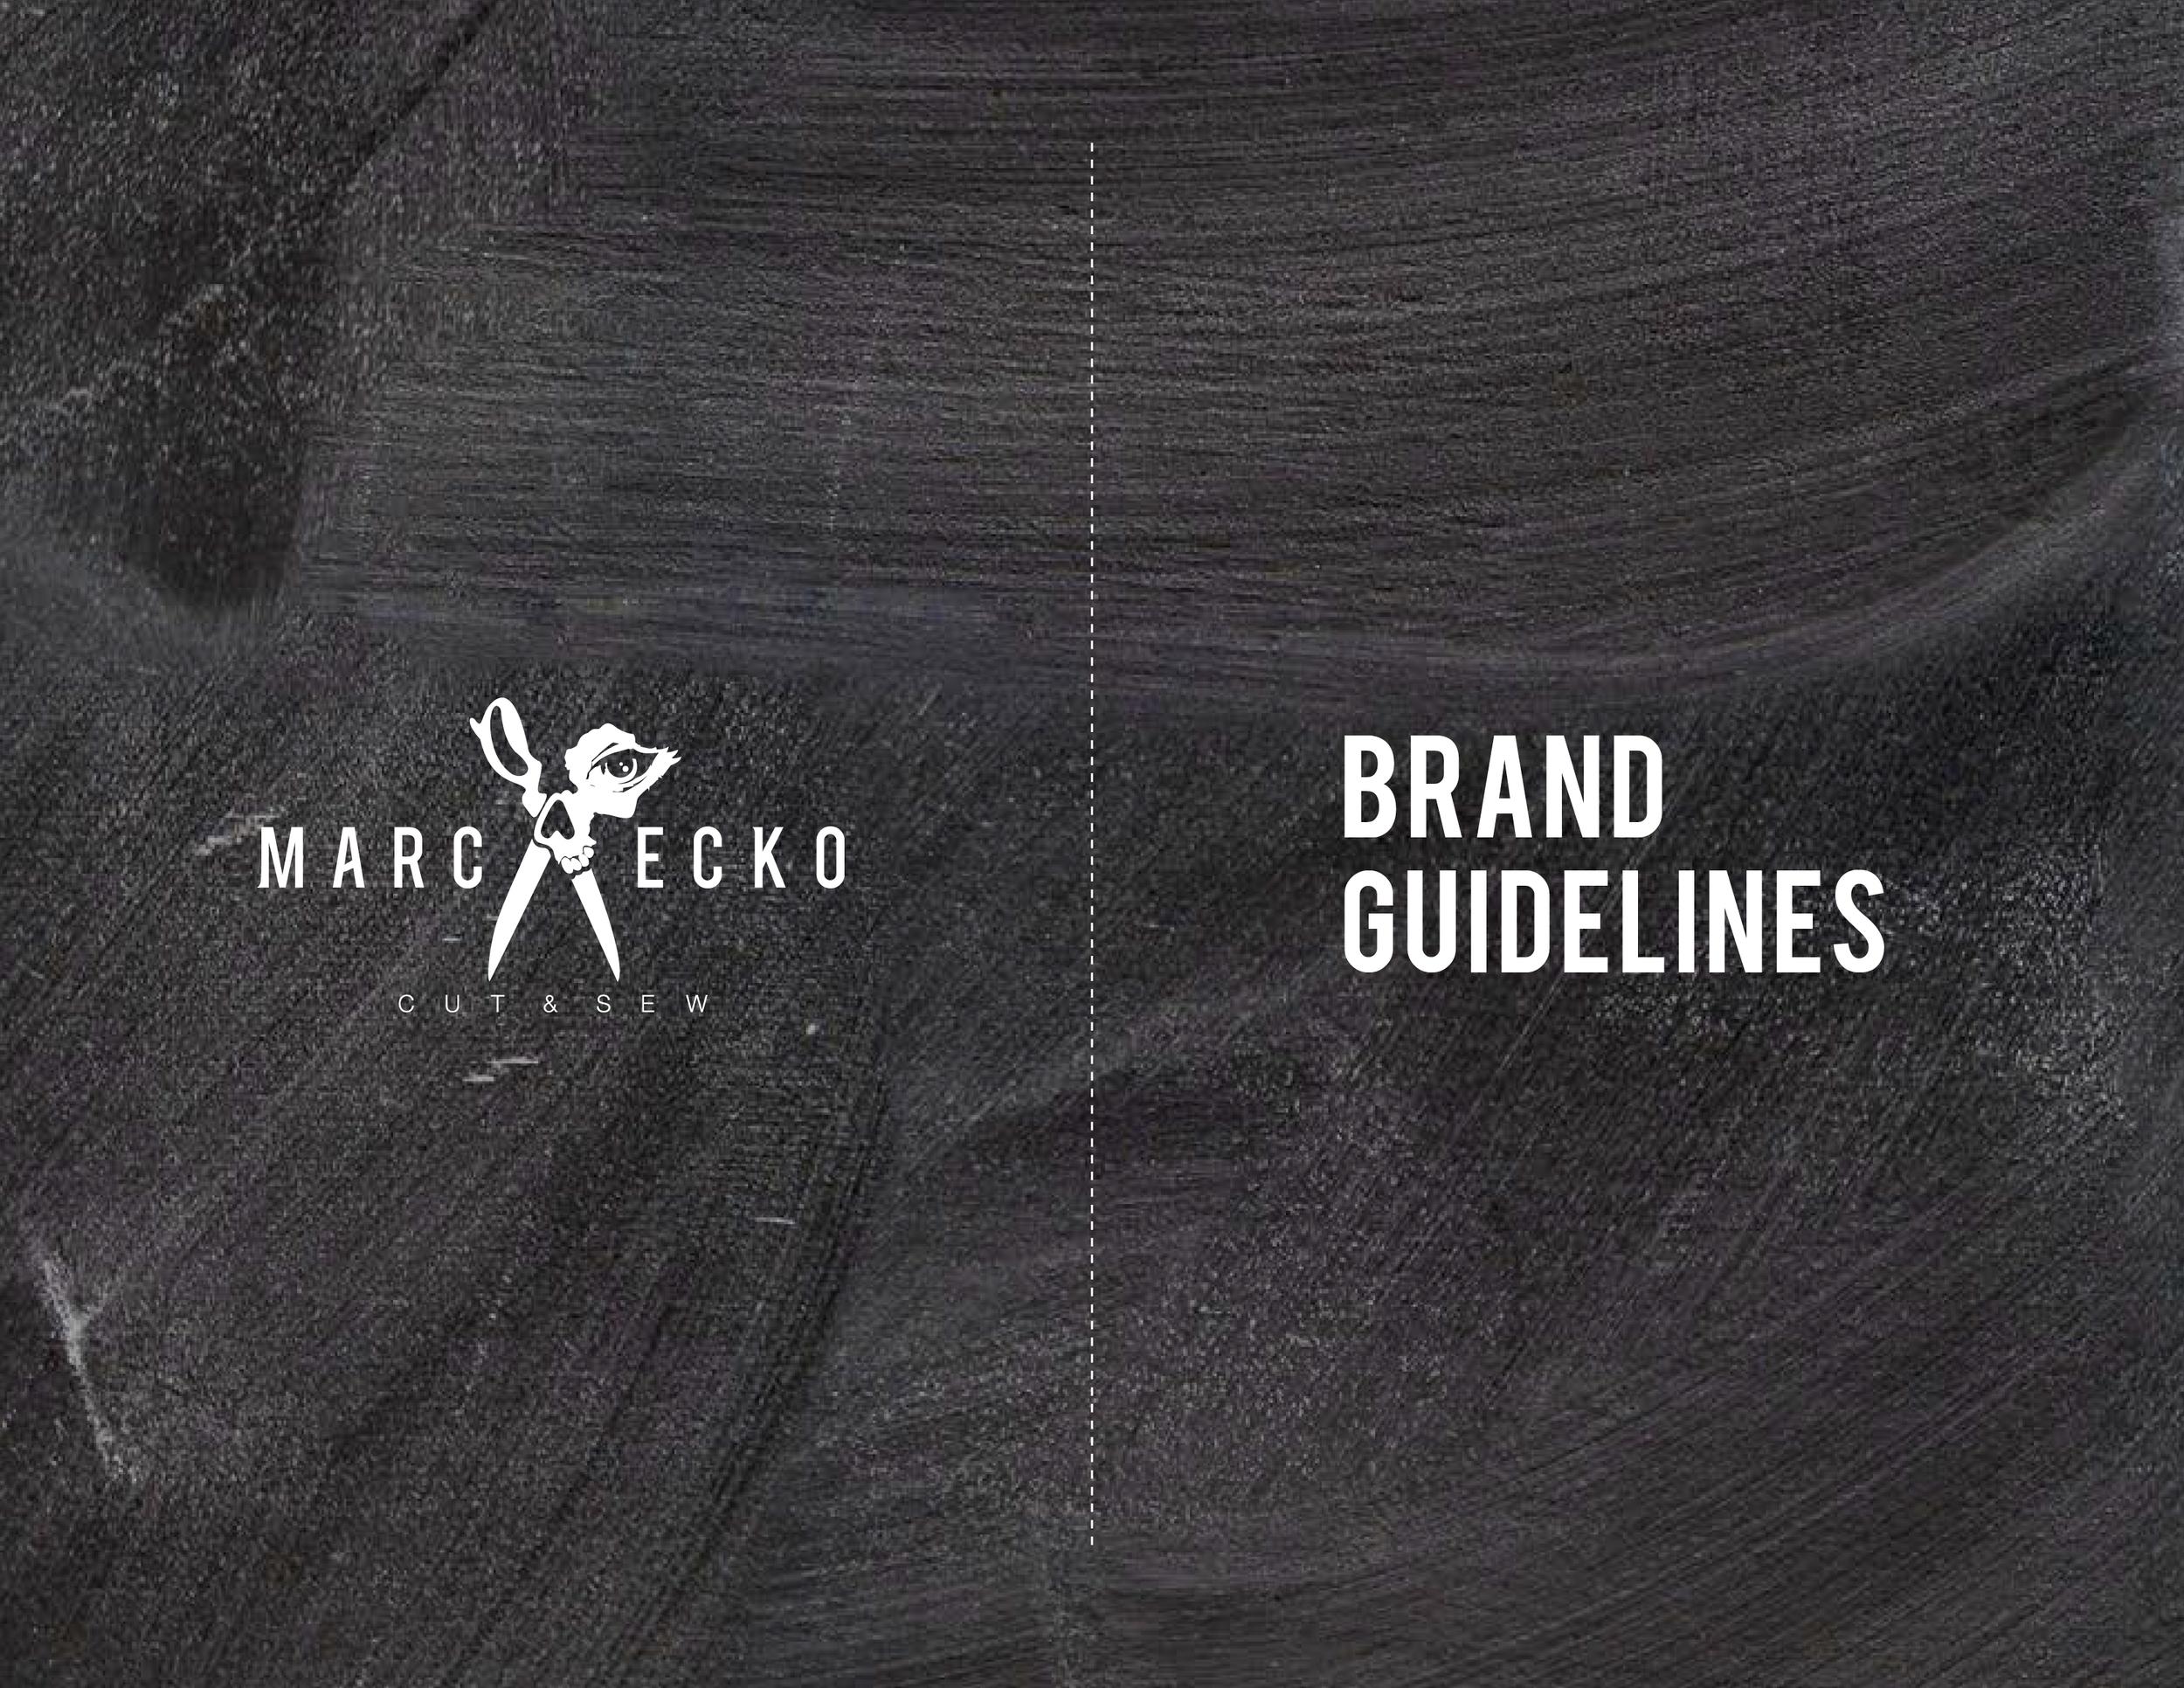 Marc-Ecko-brand-guidelines.jpg